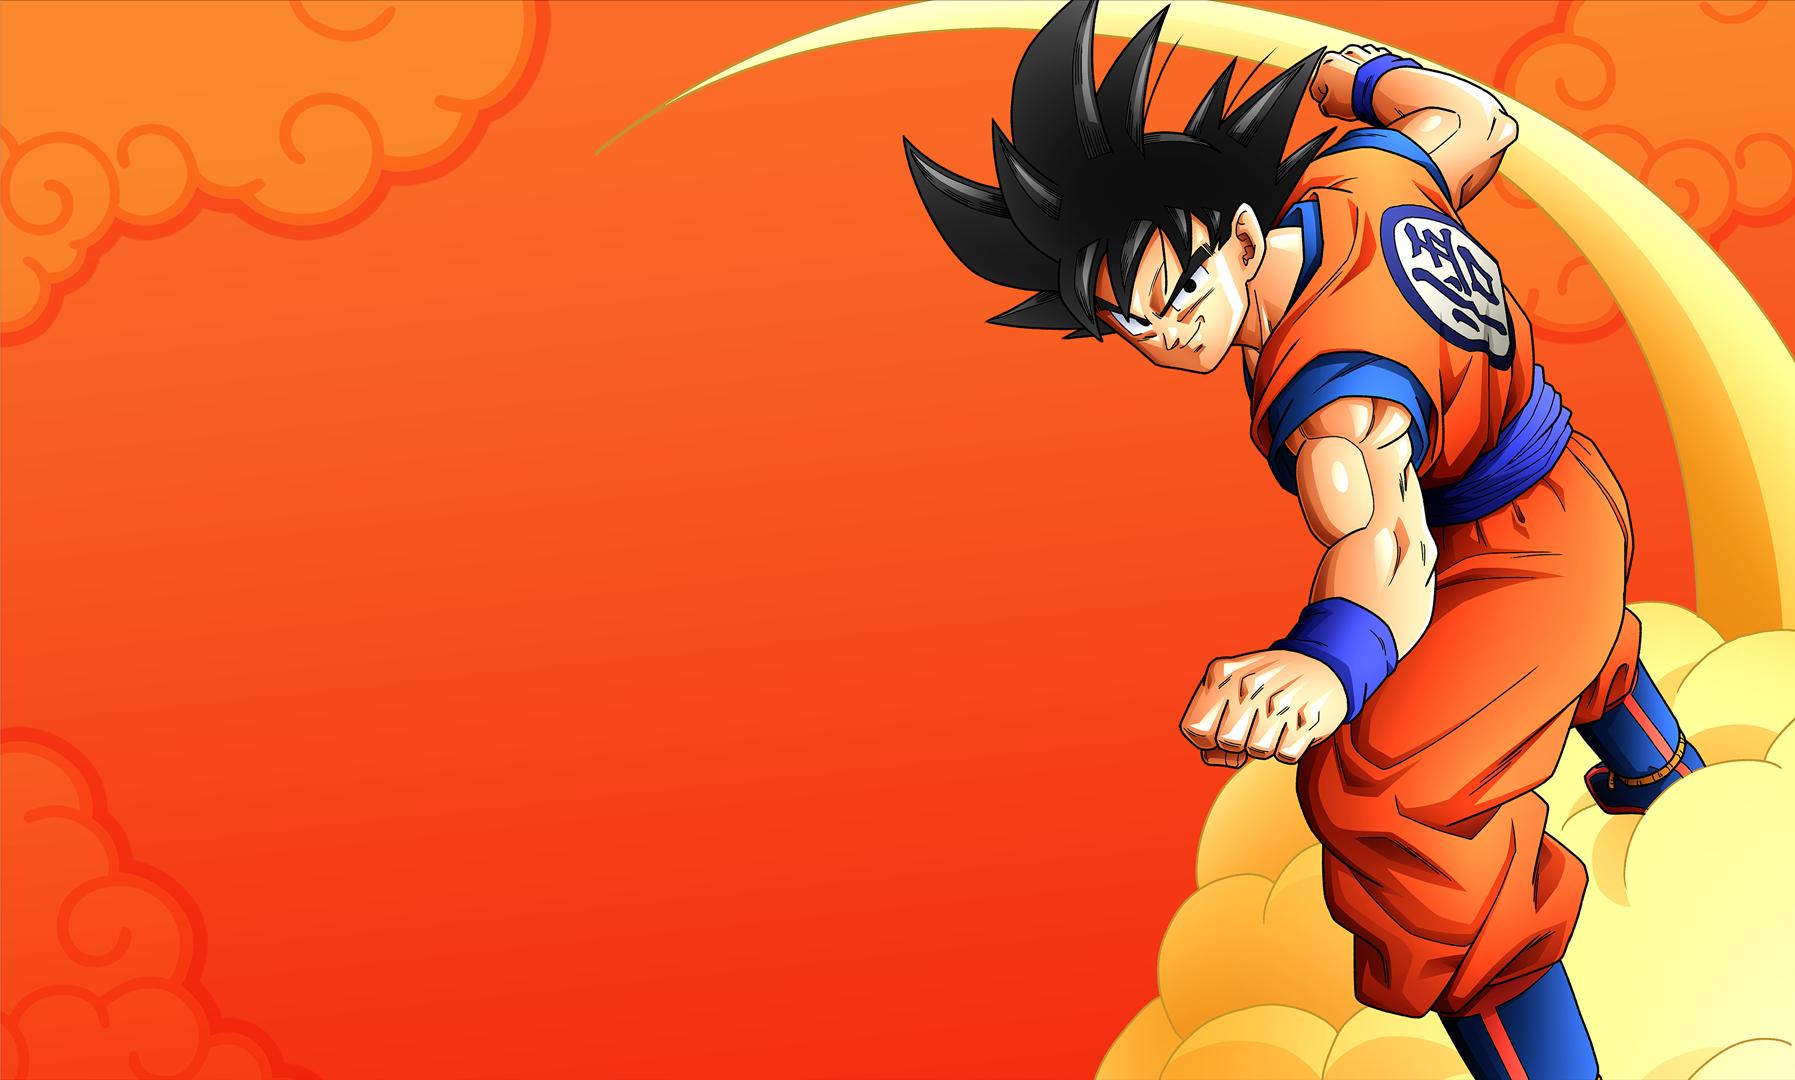 Goku Wallpaper [DBZ Kakarot] by